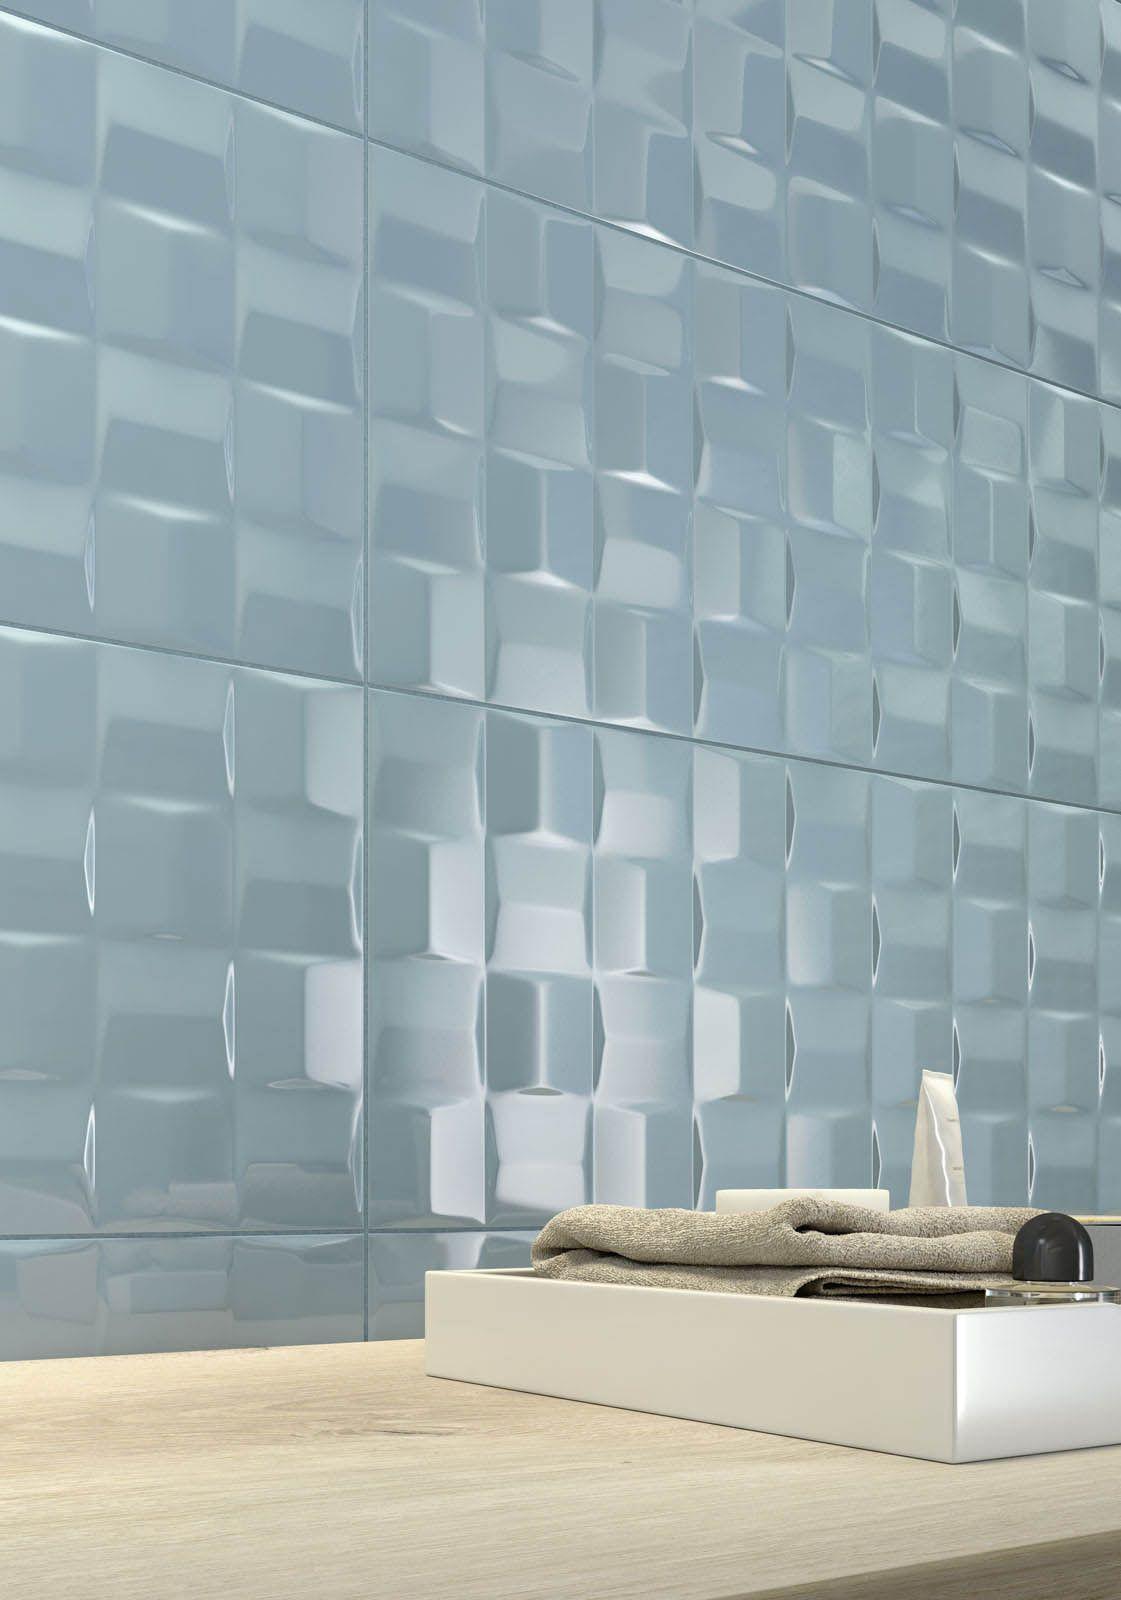 Bevelled 3D Porcelain aqua blue wall tile | Donhead | Pinterest ...